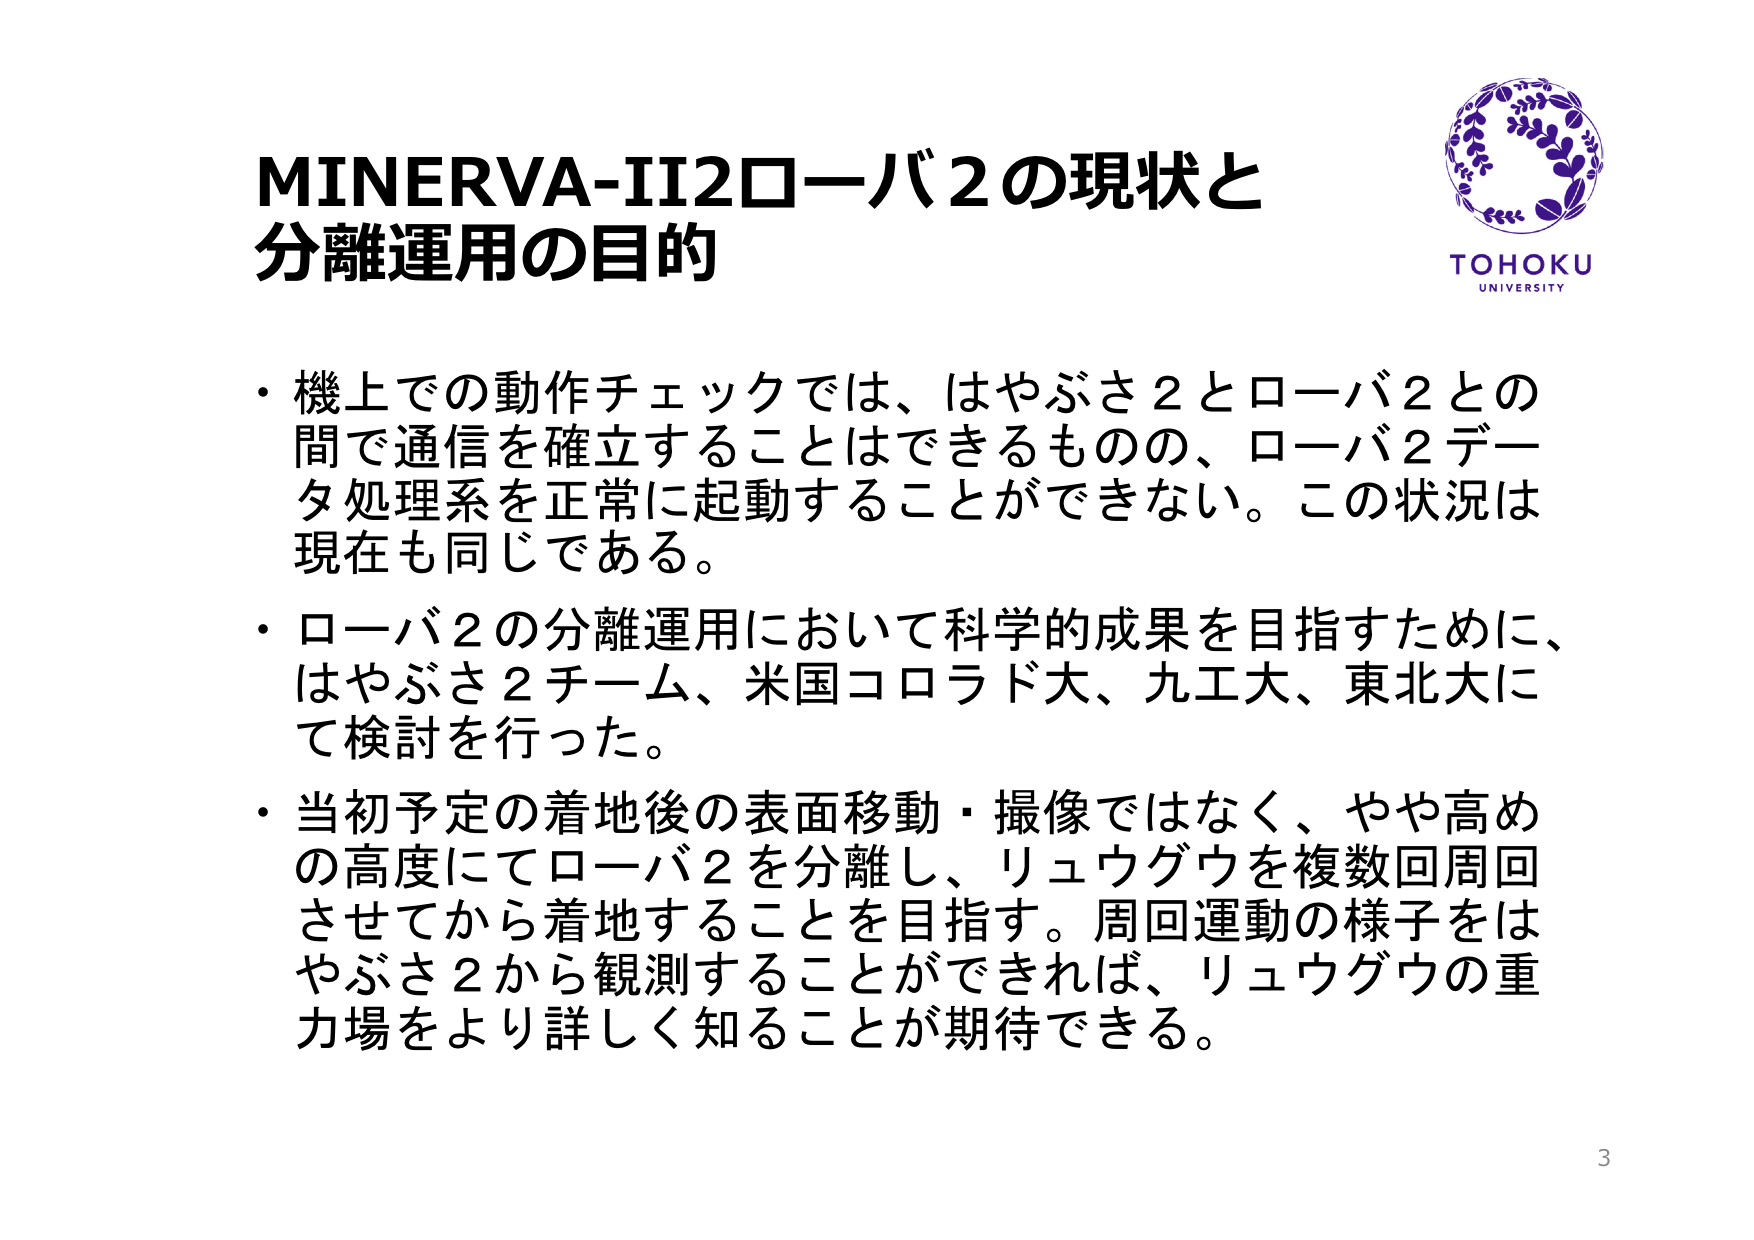 f:id:Imamura:20190924122649p:plain